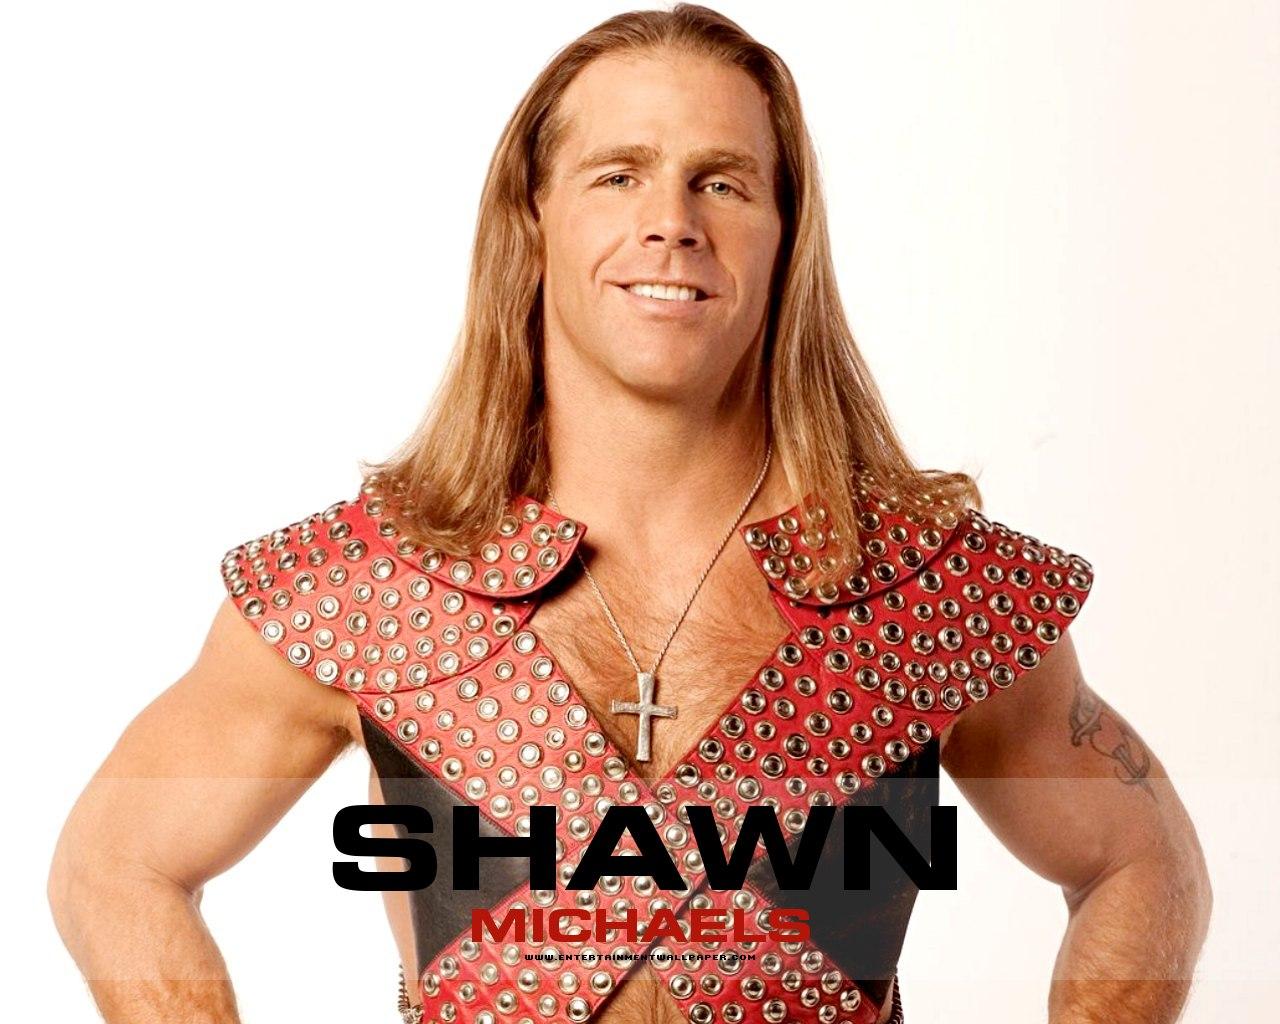 Shawn Michaels Latest Photo